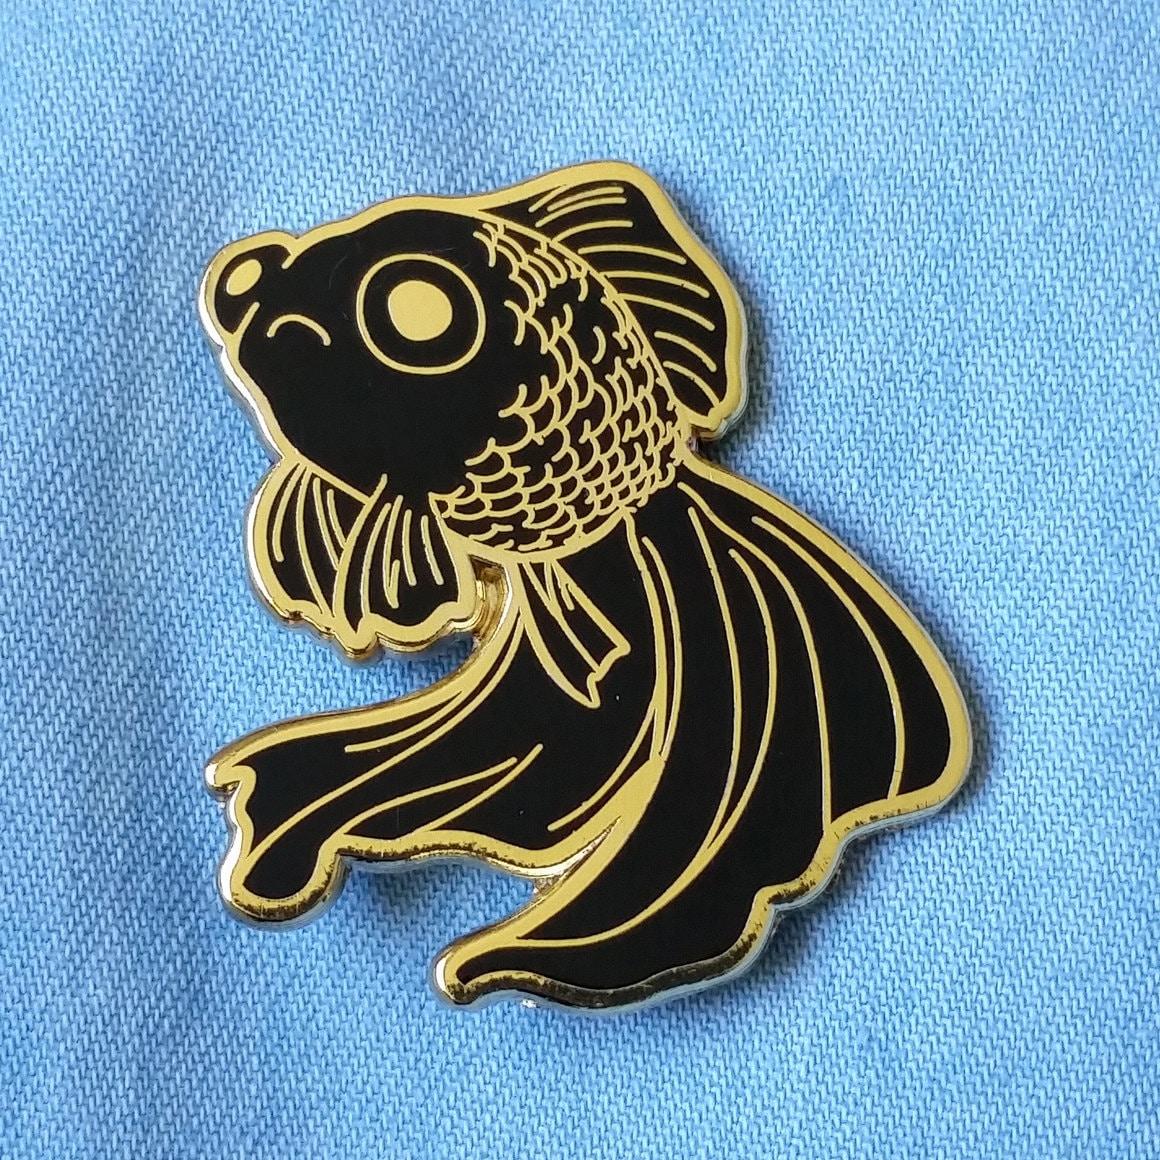 Sad Fish Hard Enamel Pin Gold and Black Lapel Pin